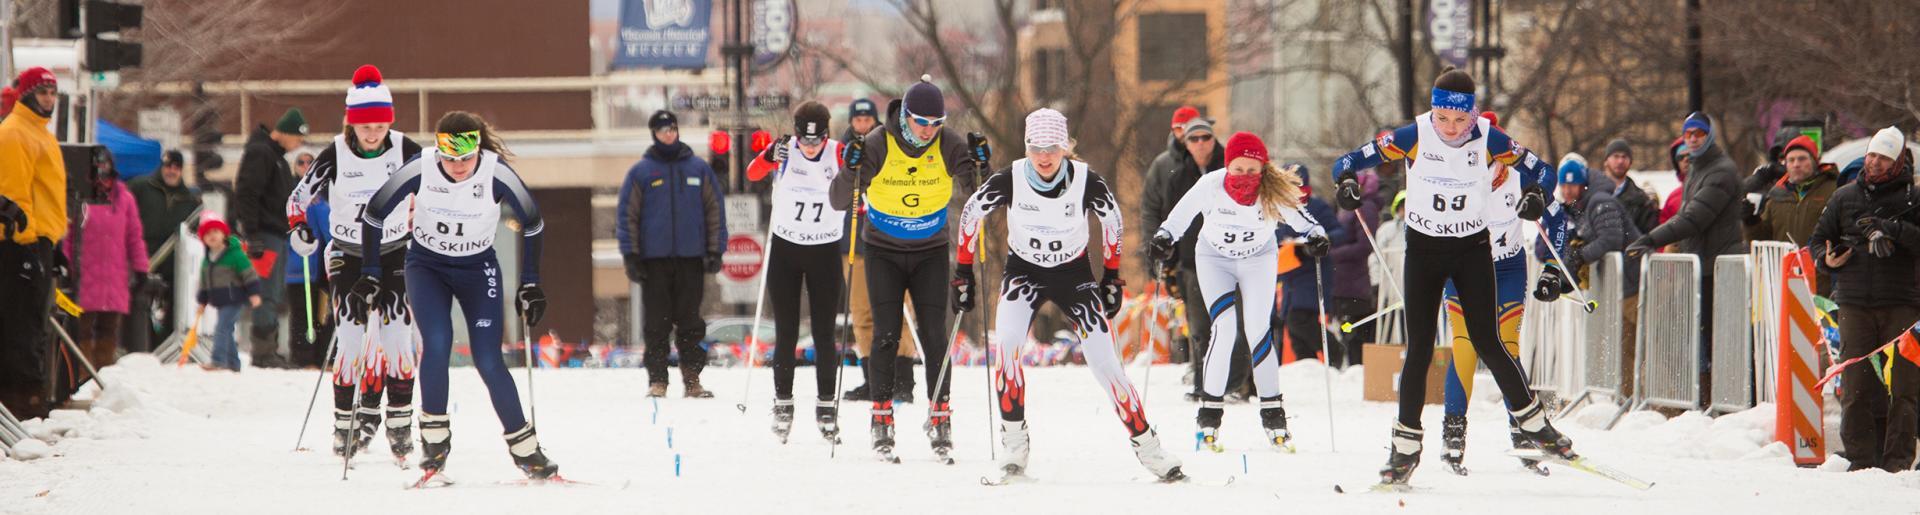 Skiing at WinterFest